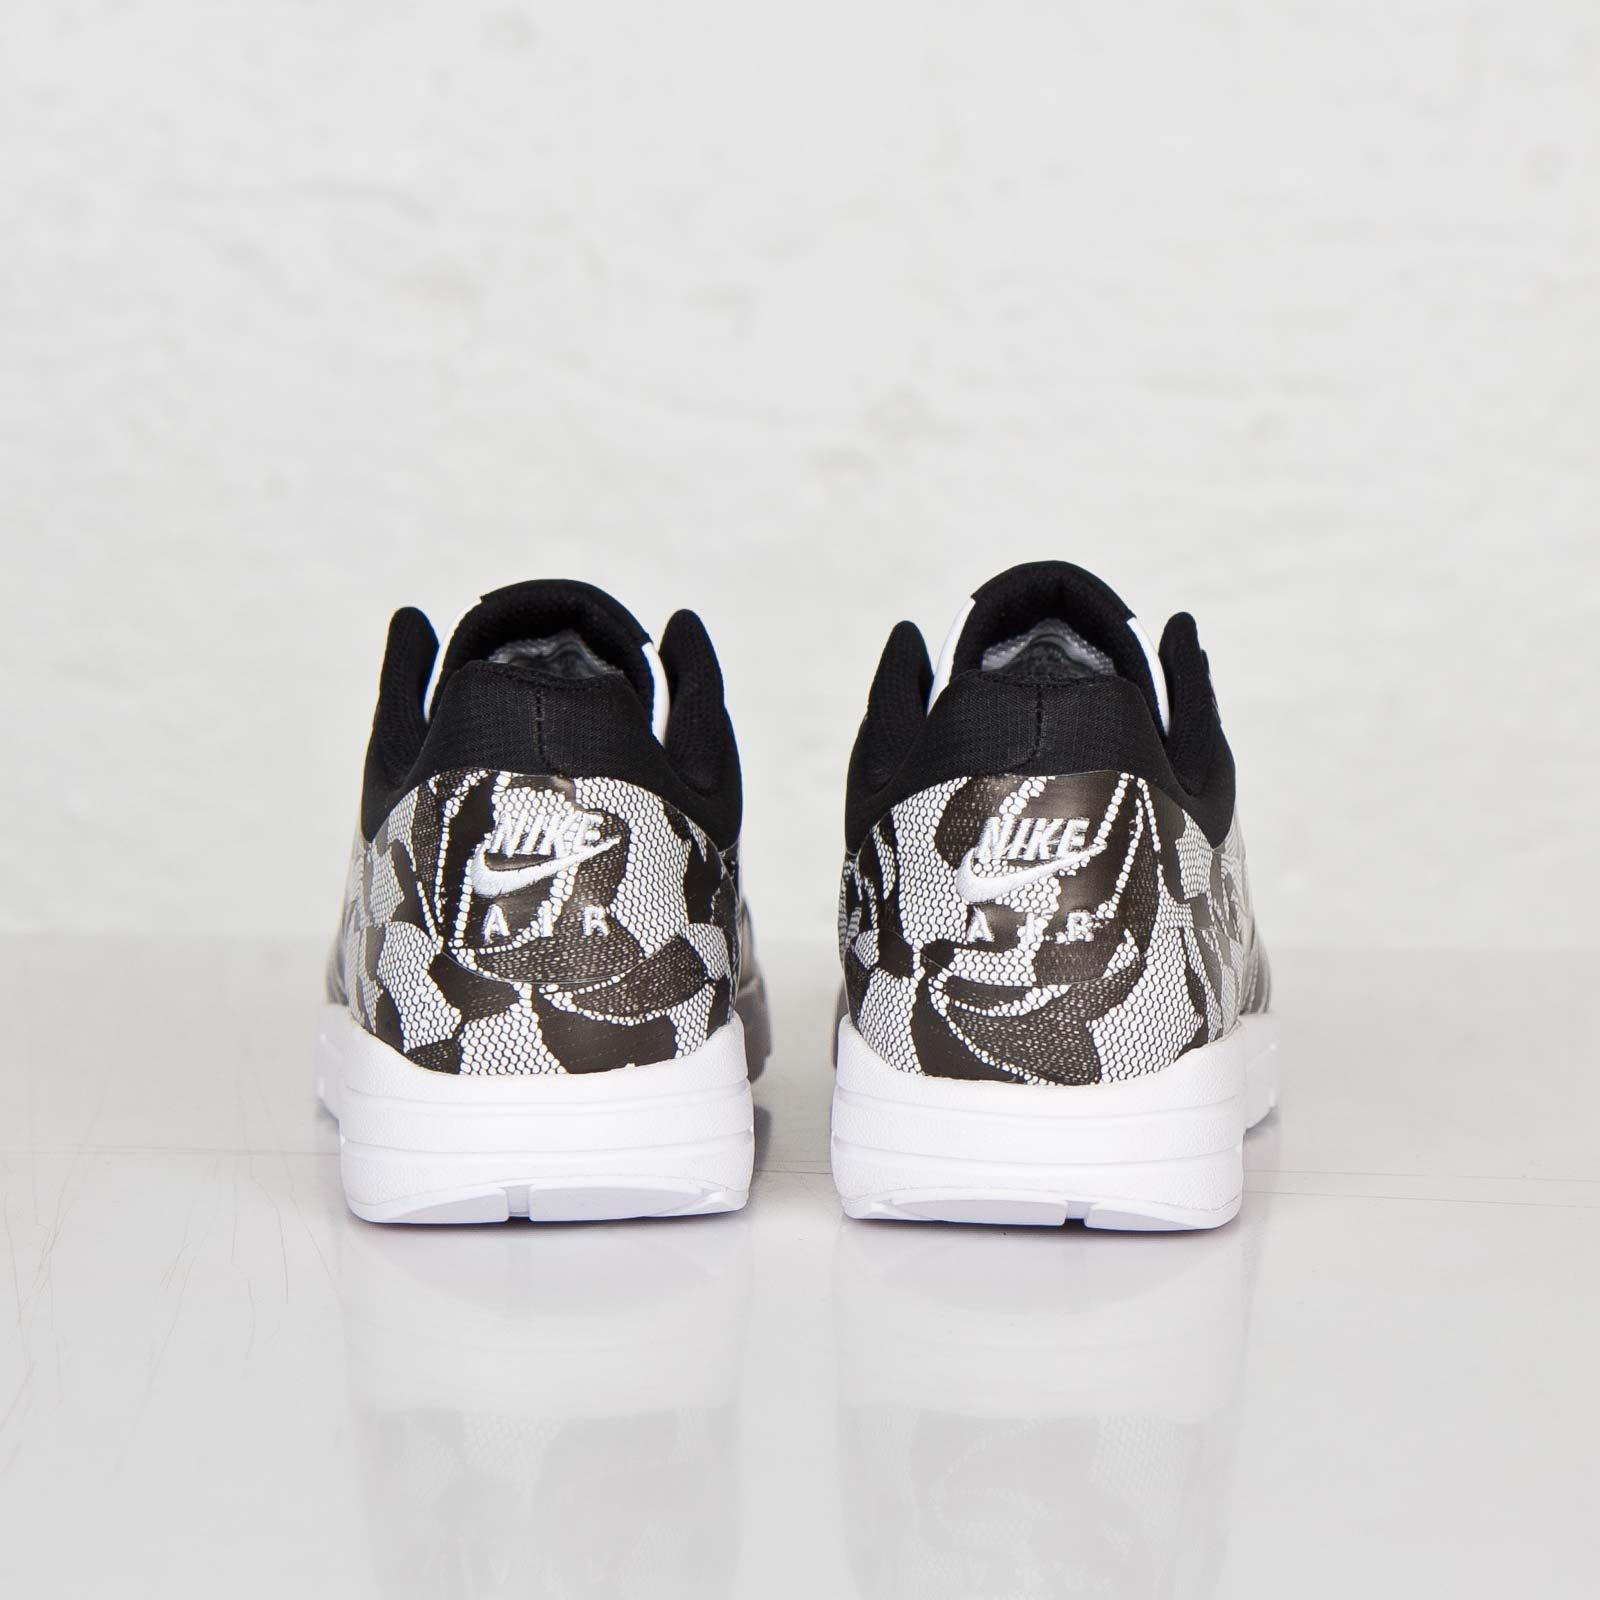 best value 1f7e5 9bfdd Nike Wmns Air Max 1 Ultra SP - 789564-001 - Sneakersnstuff   sneakers   streetwear  online since 1999